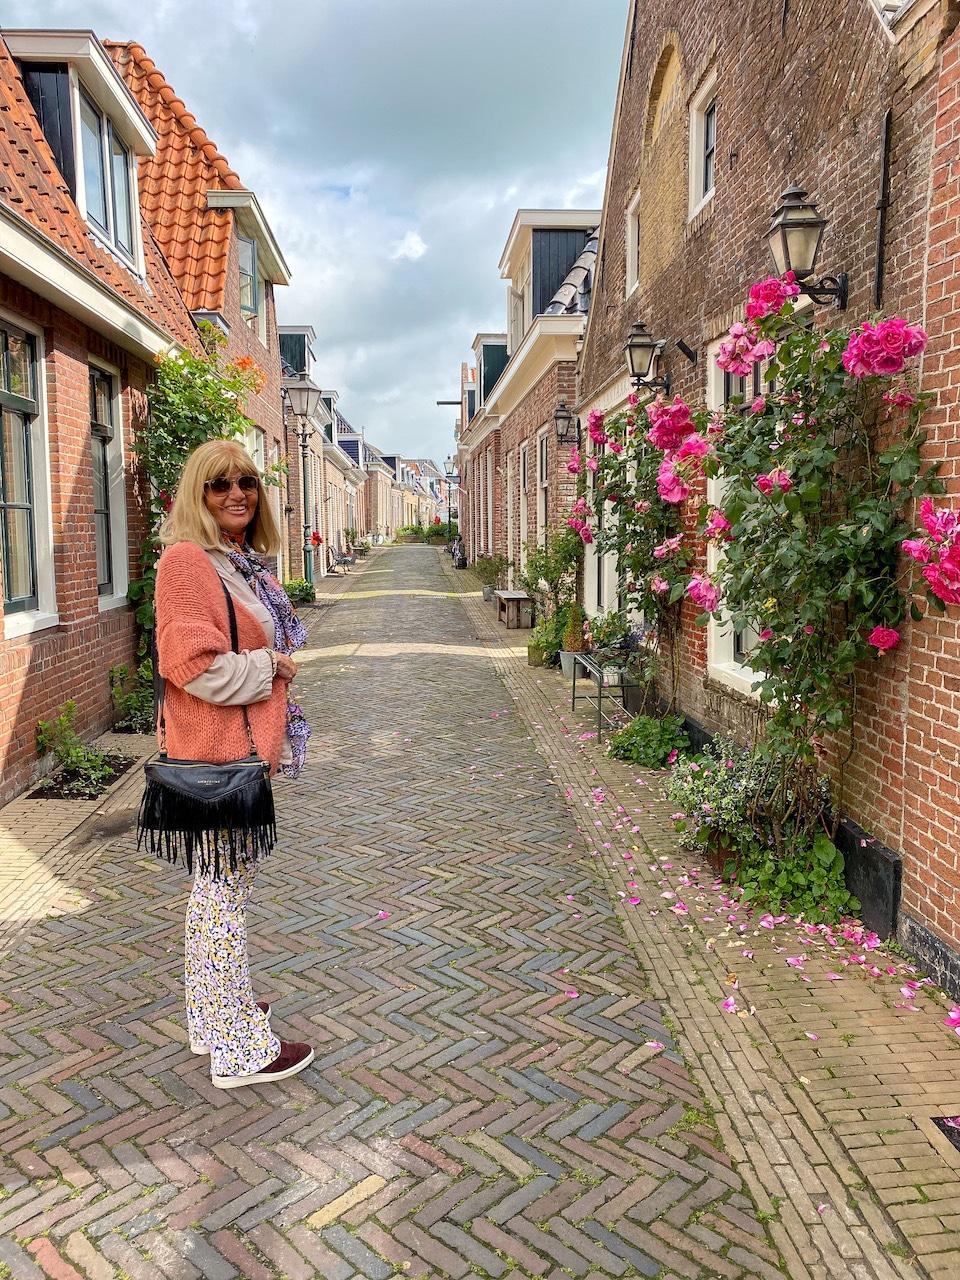 Vaarvakantie in Friesland - vaarroute voor 1 week - 11 Stegentocht van Woudsend.